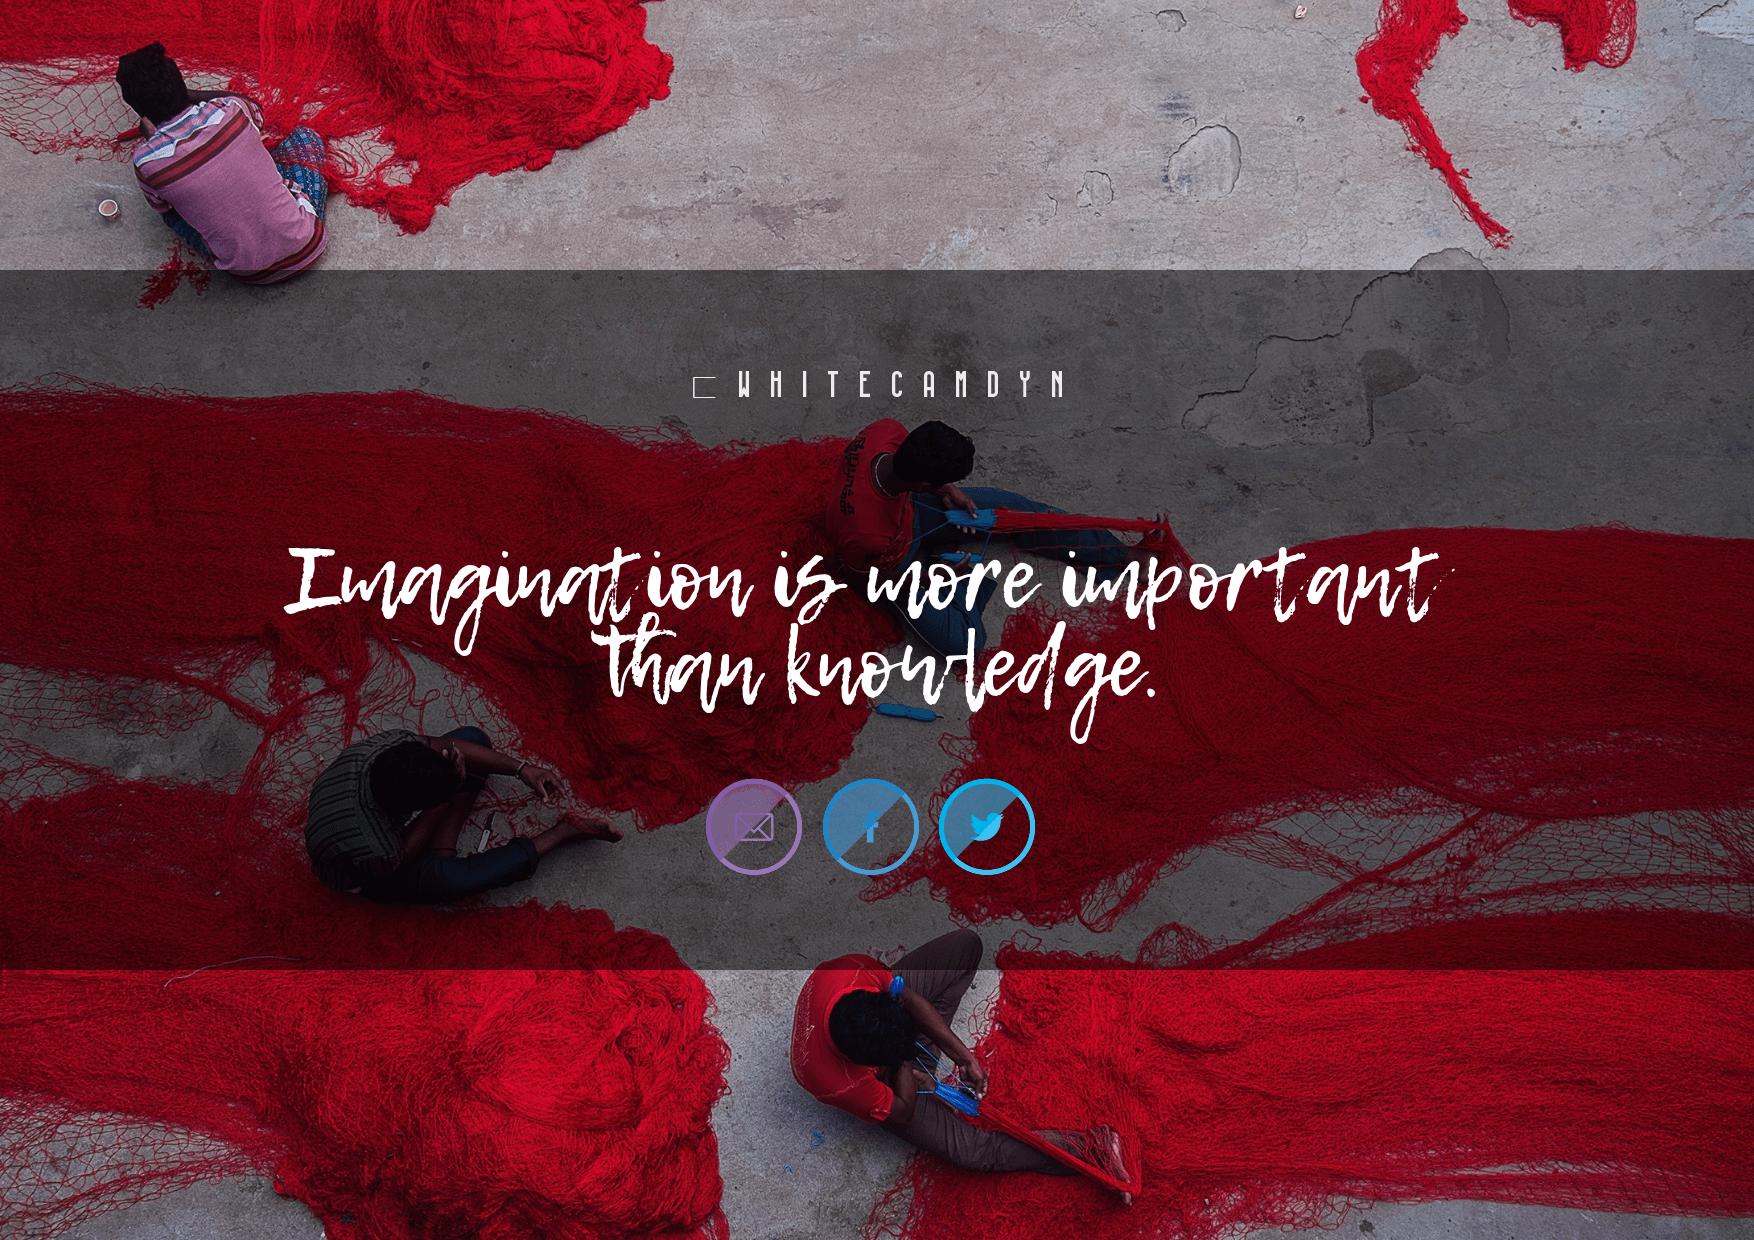 Red,                Text,                Petal,                Textile,                Font,                Material,                Art,                Graphics,                Artwork,                Modern,                Line,                Sky,                Purple,                 Free Image